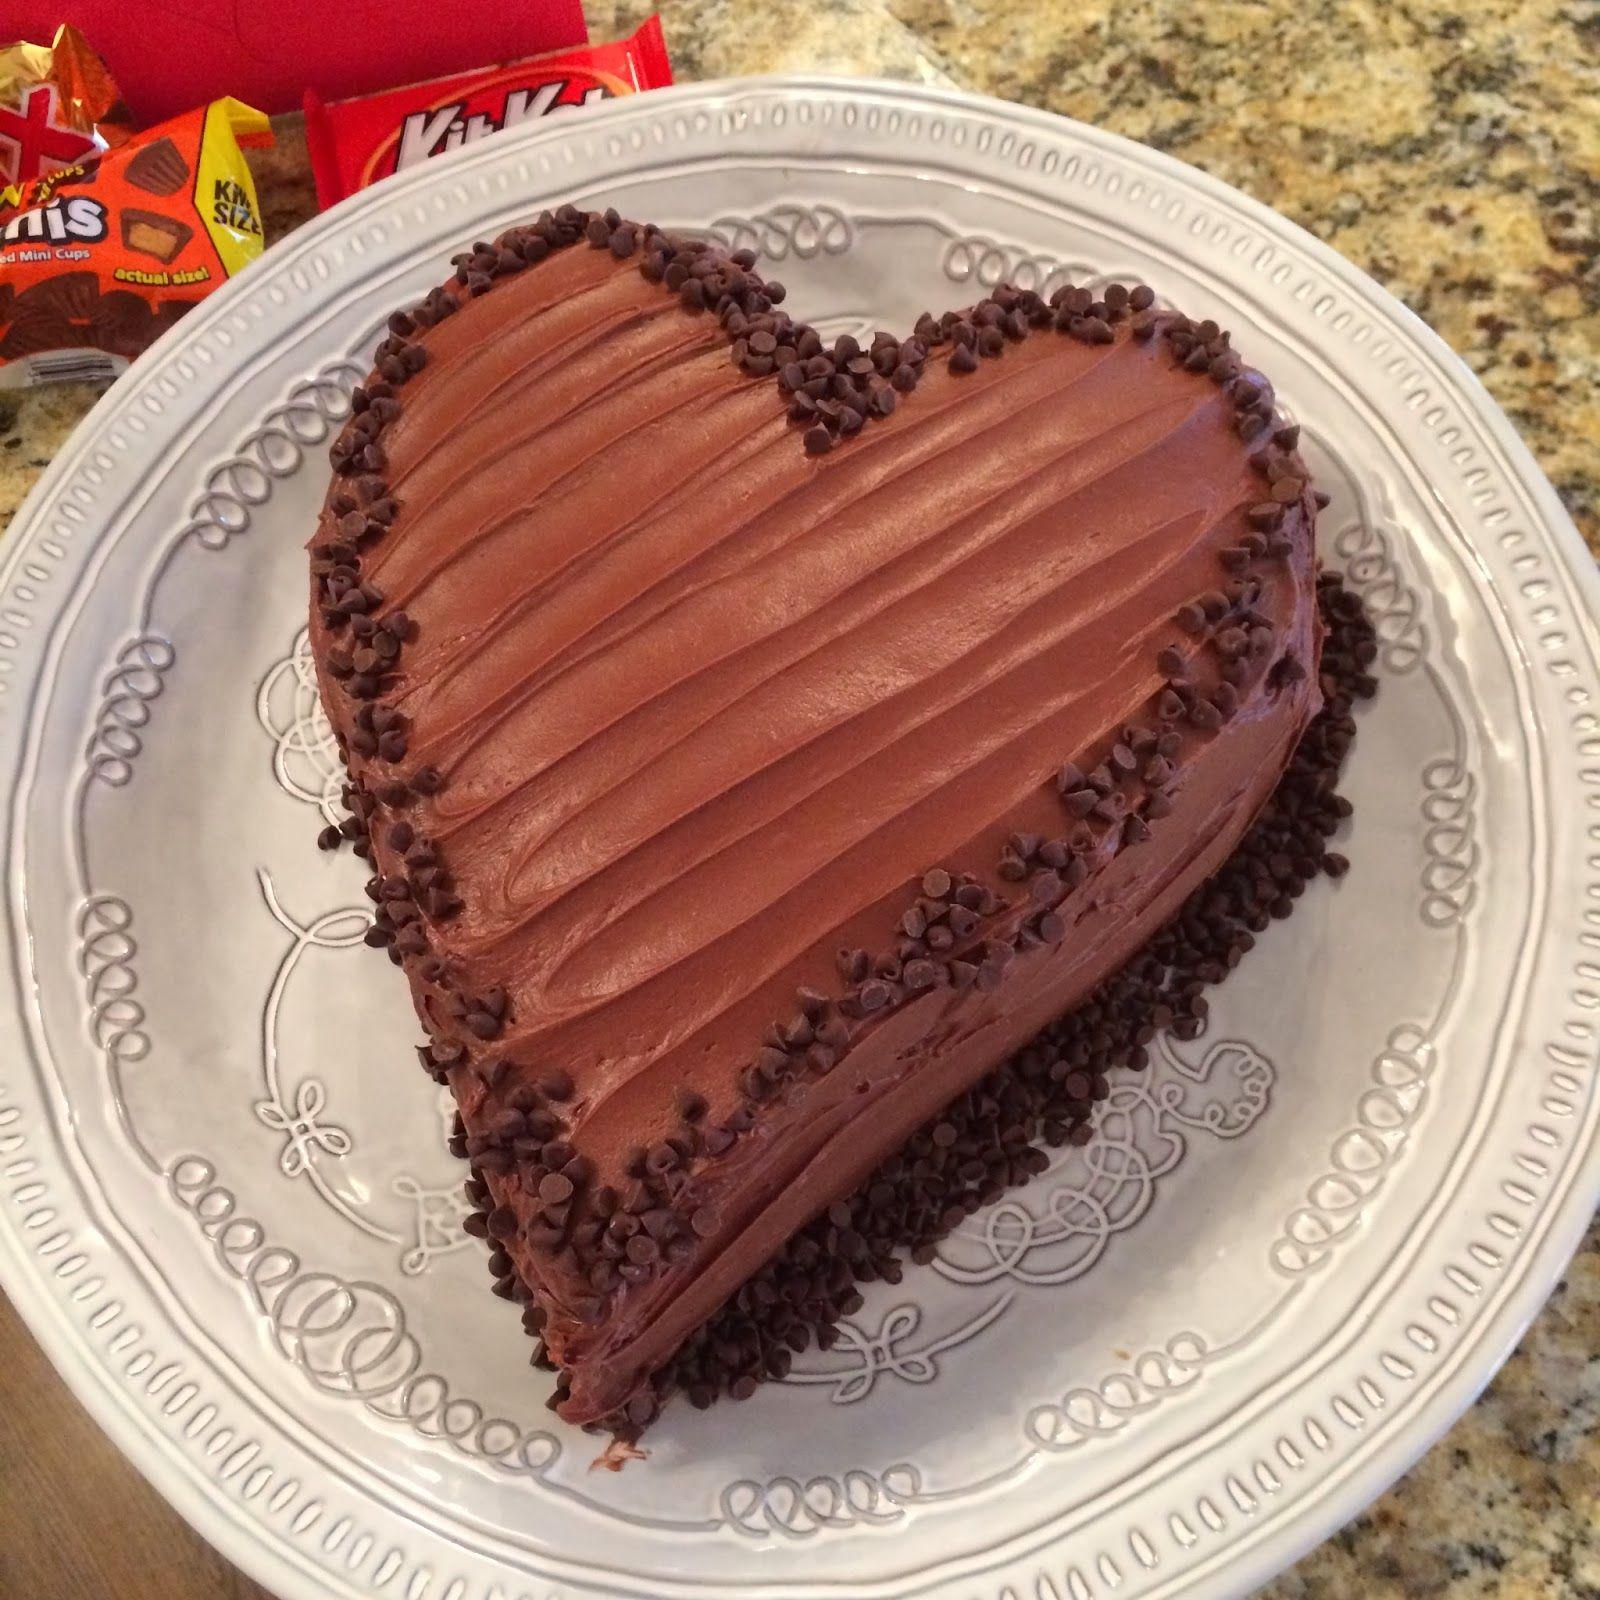 Chocolate Whiskey Cake Recipe (2 Versions)